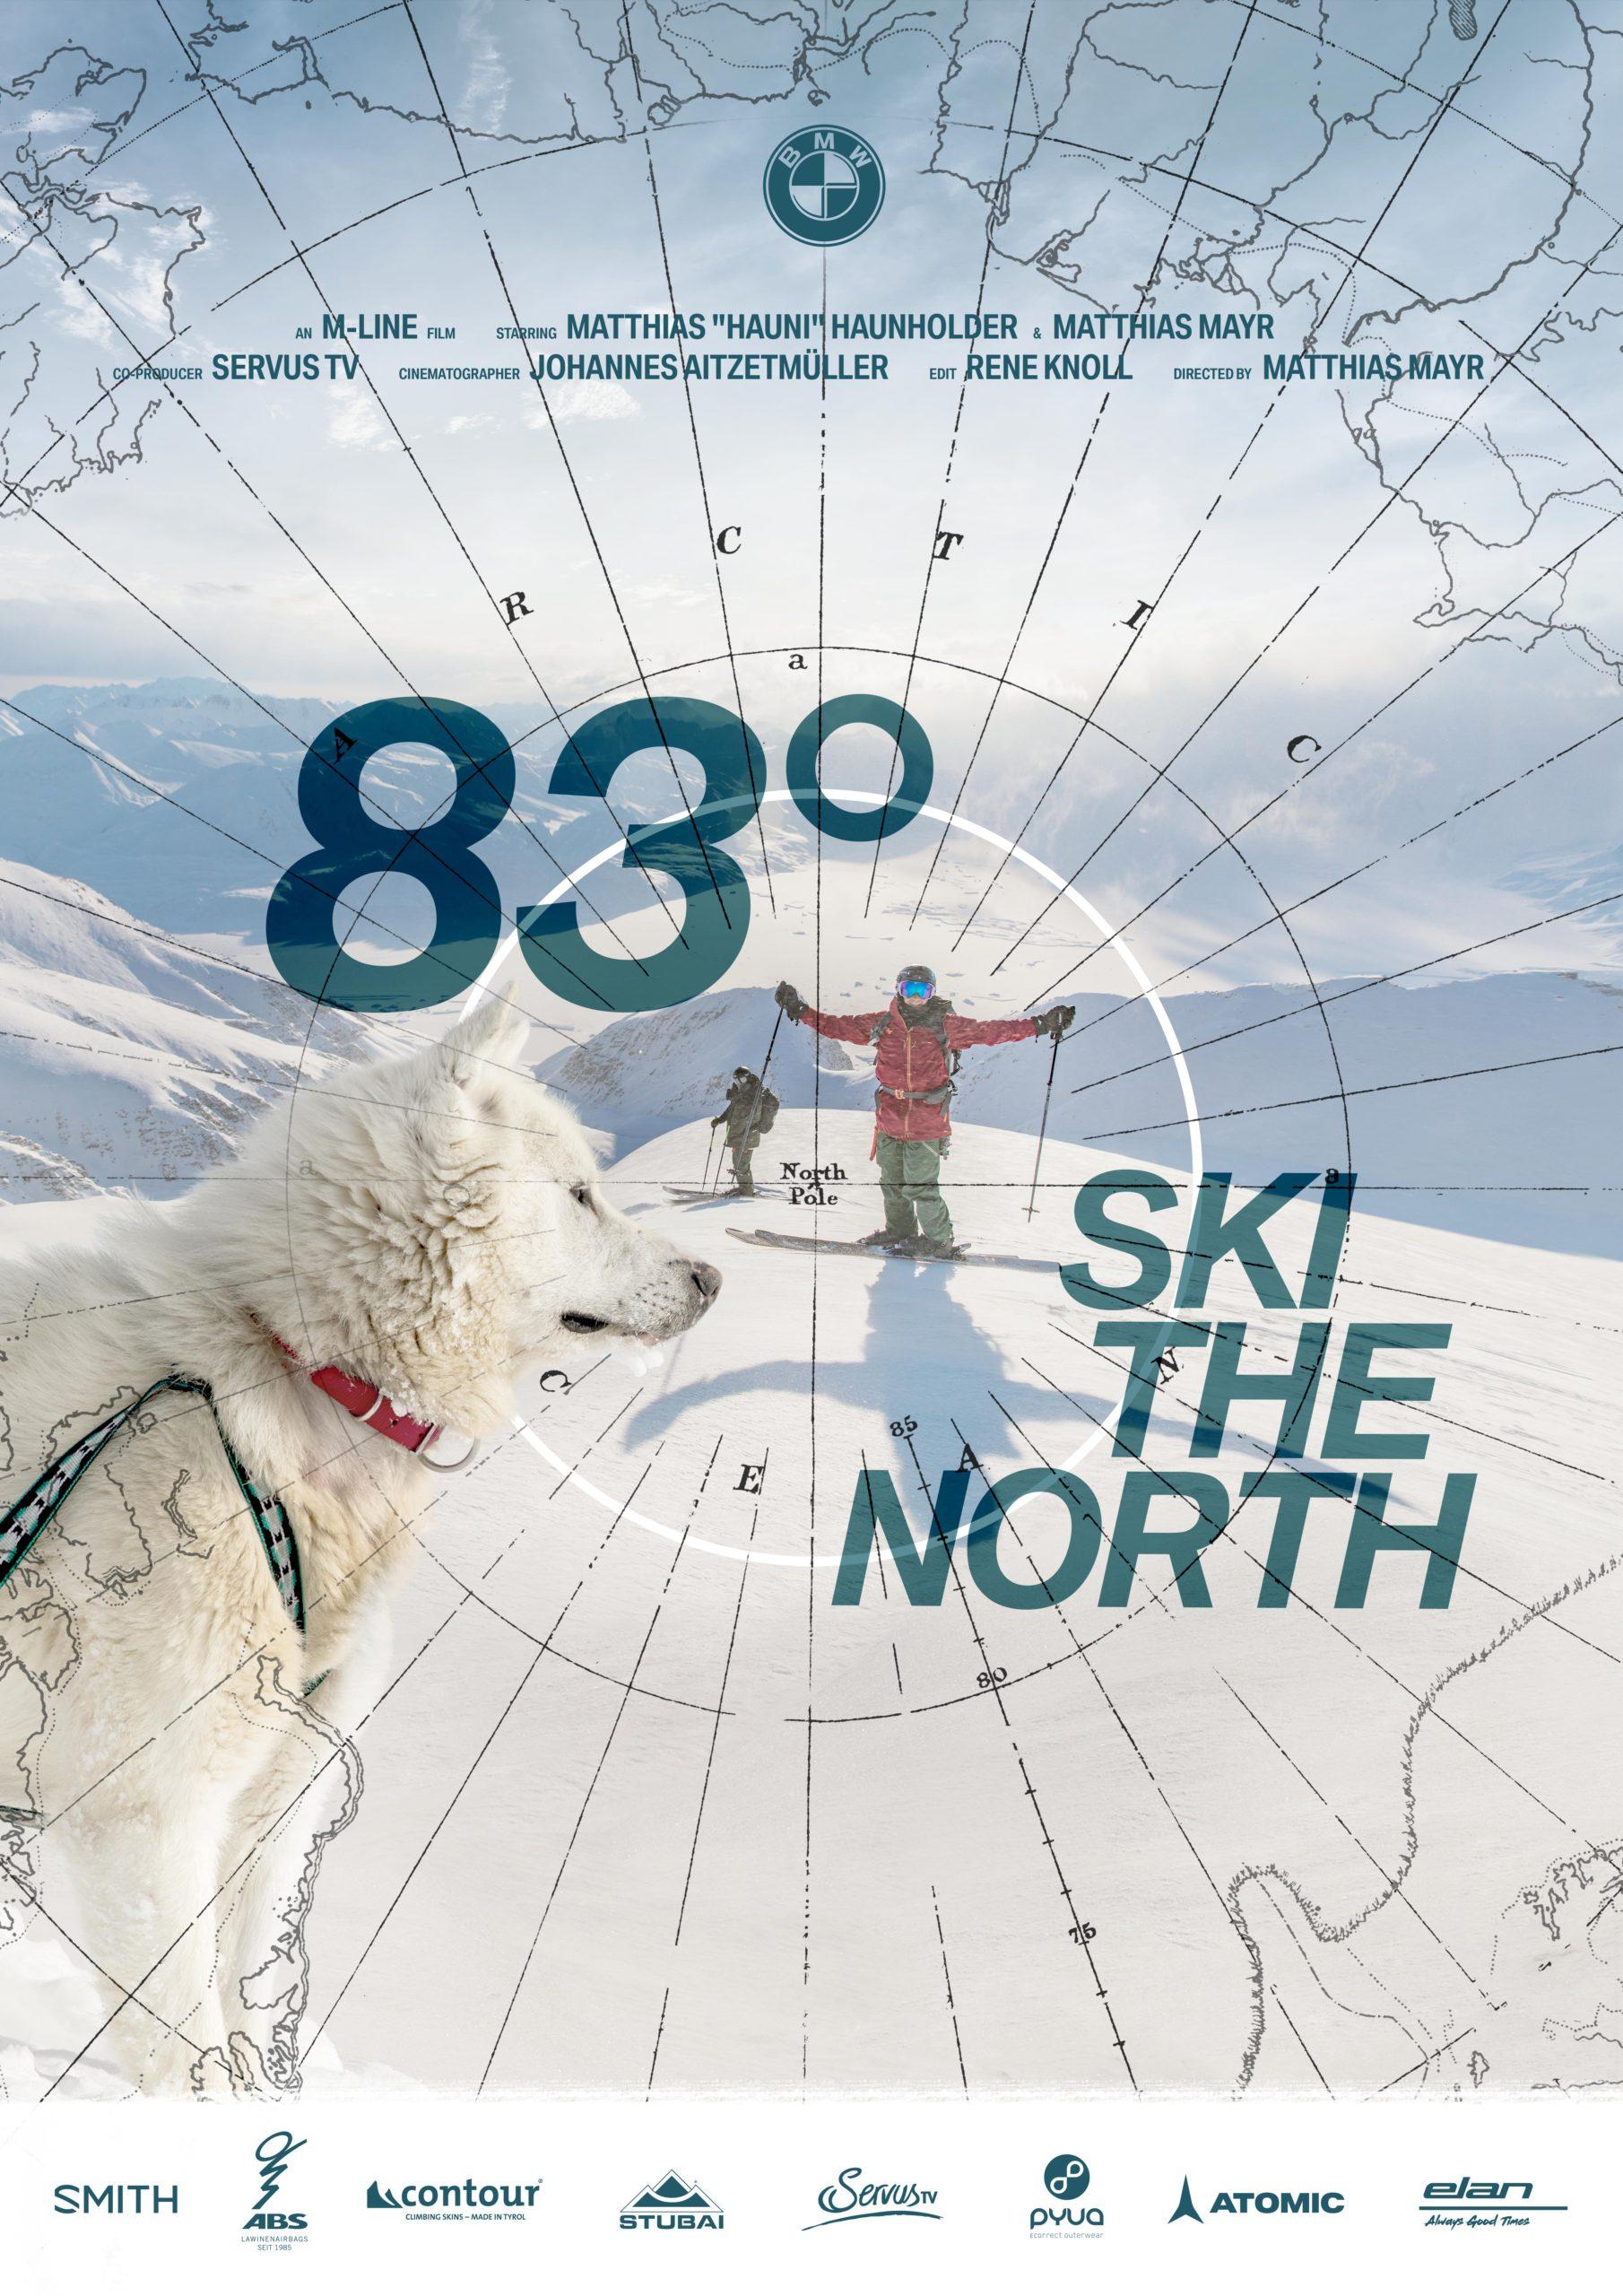 83° Ski The North